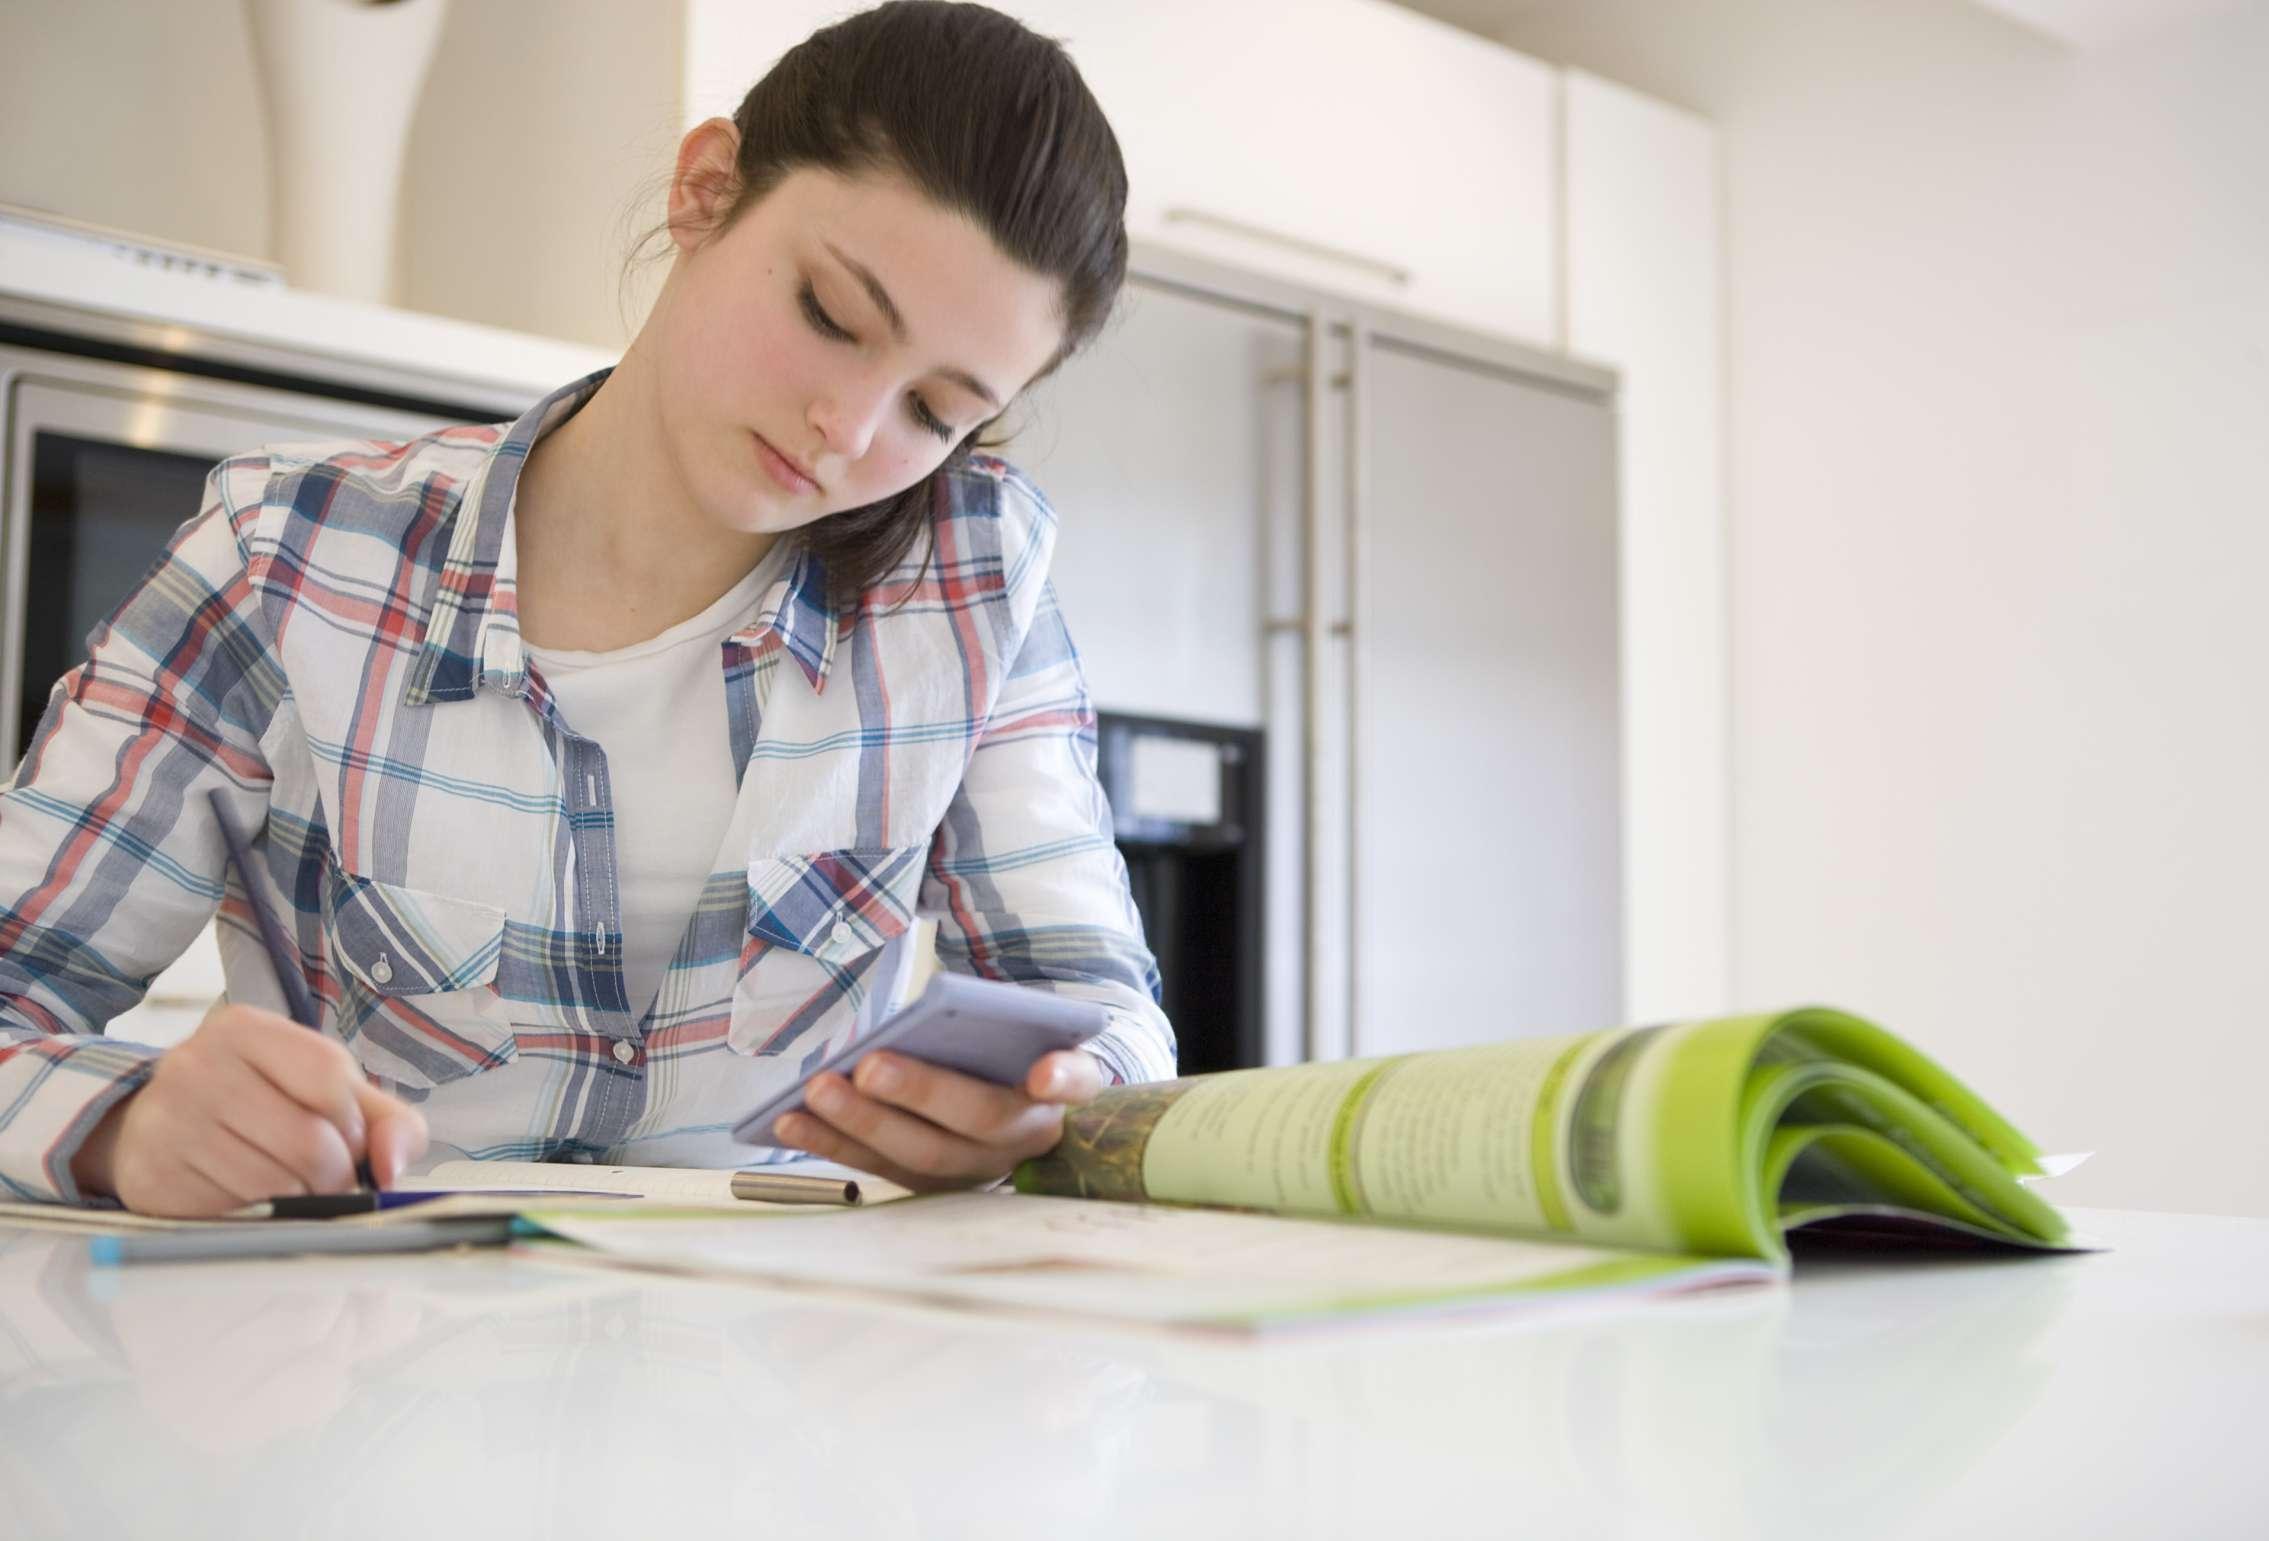 Online high school student studies with calculator.